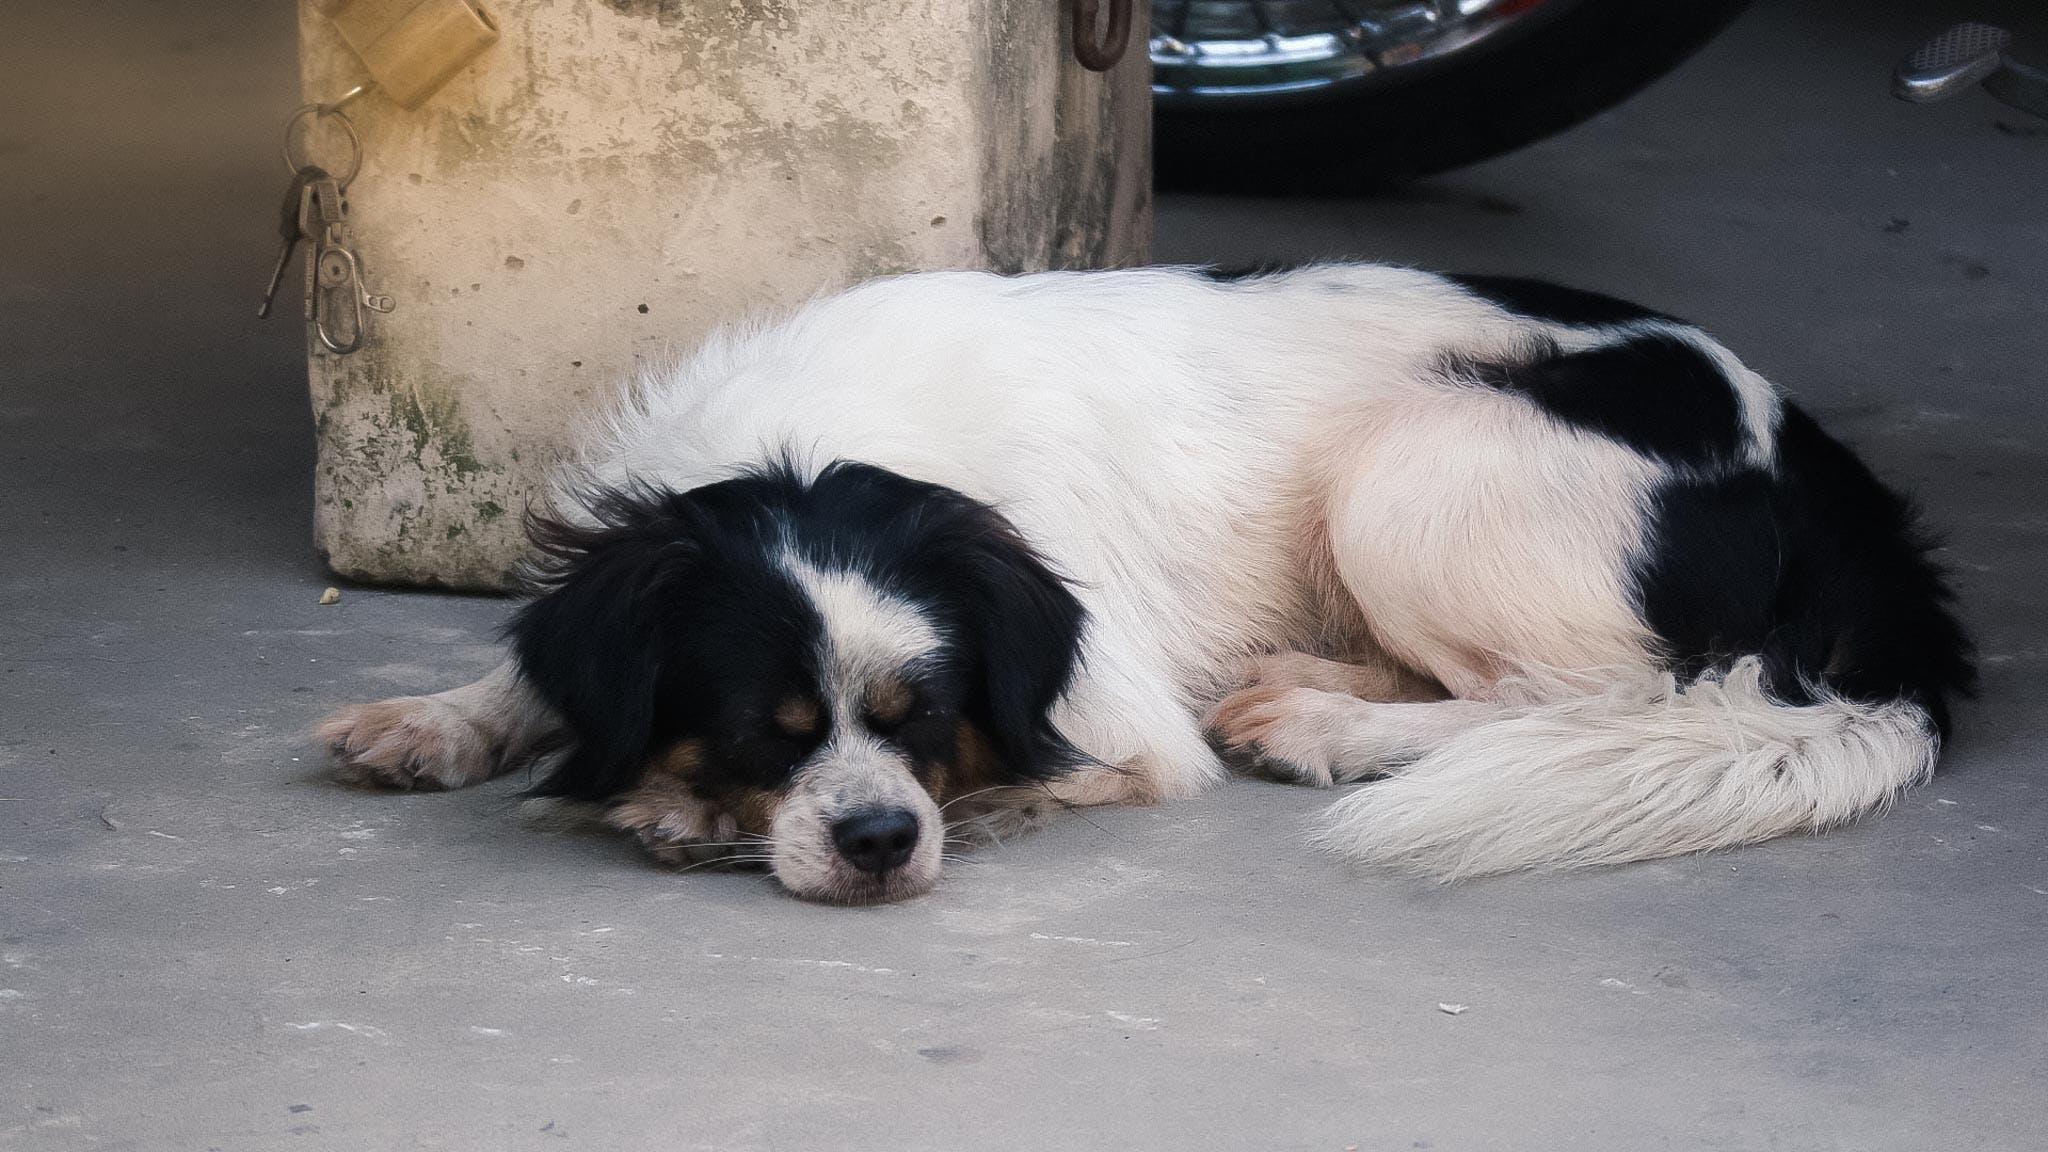 Free stock photo of dog, My dog, Pet love, sleep